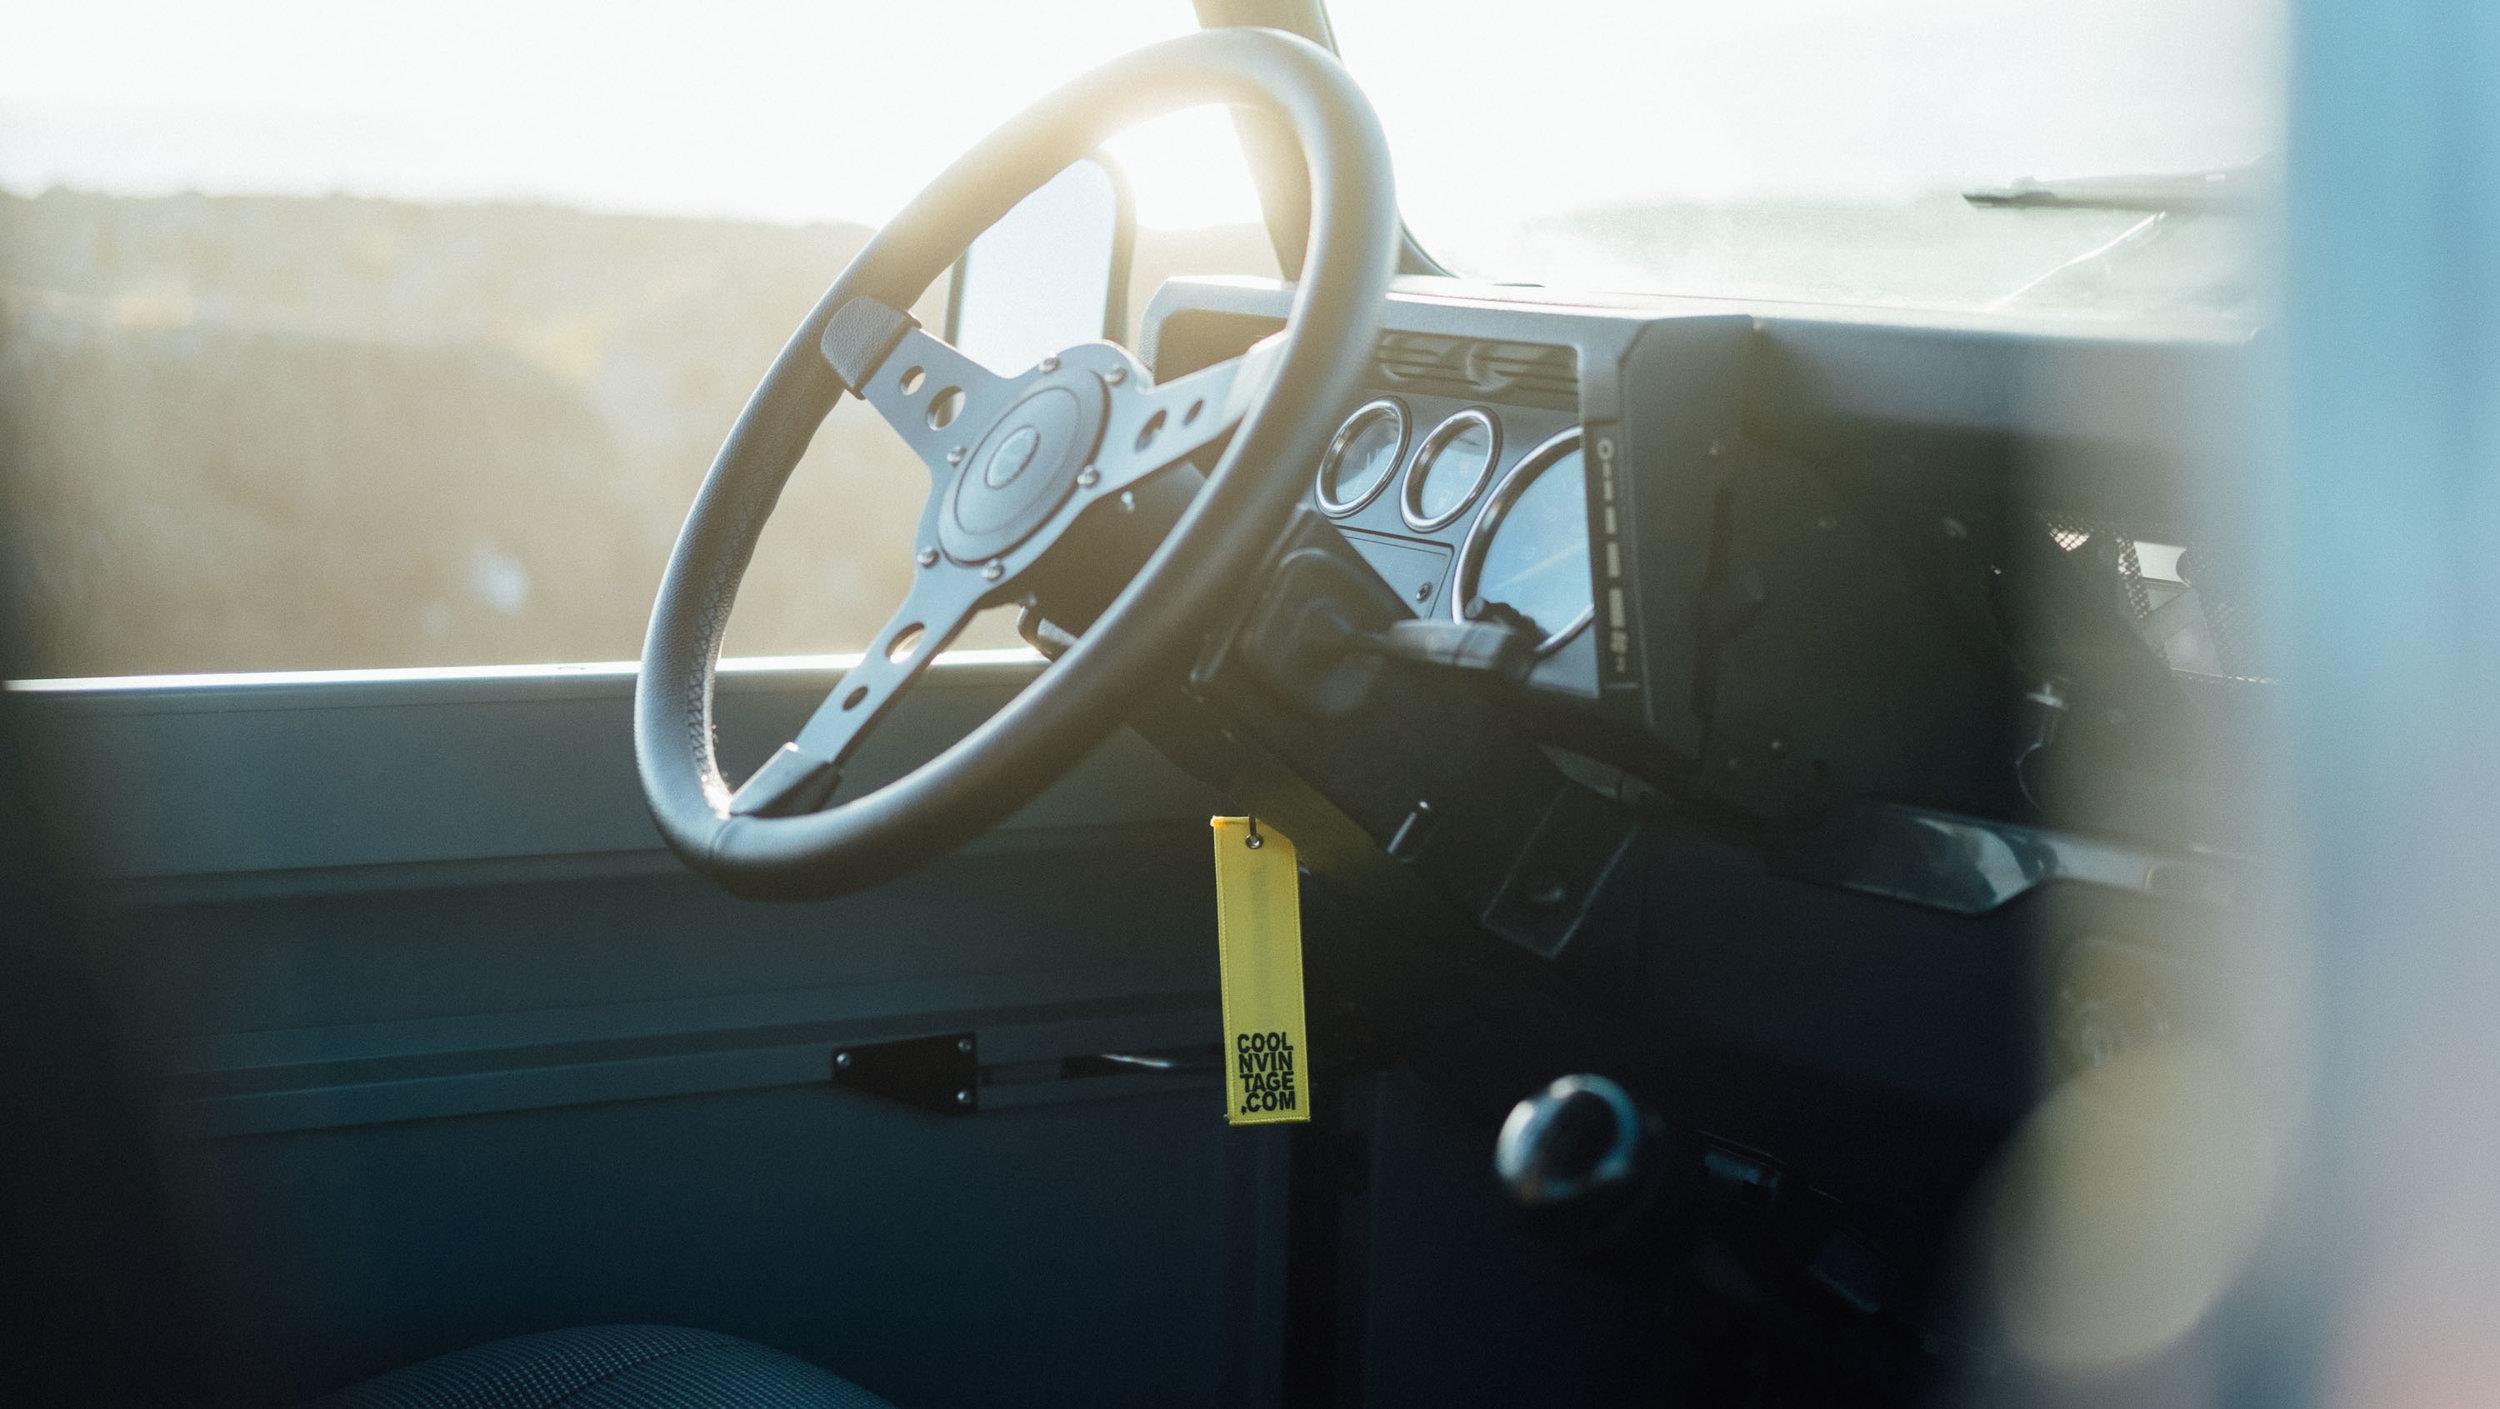 coolnvintage Land Rover Defender (52 of 98).jpg